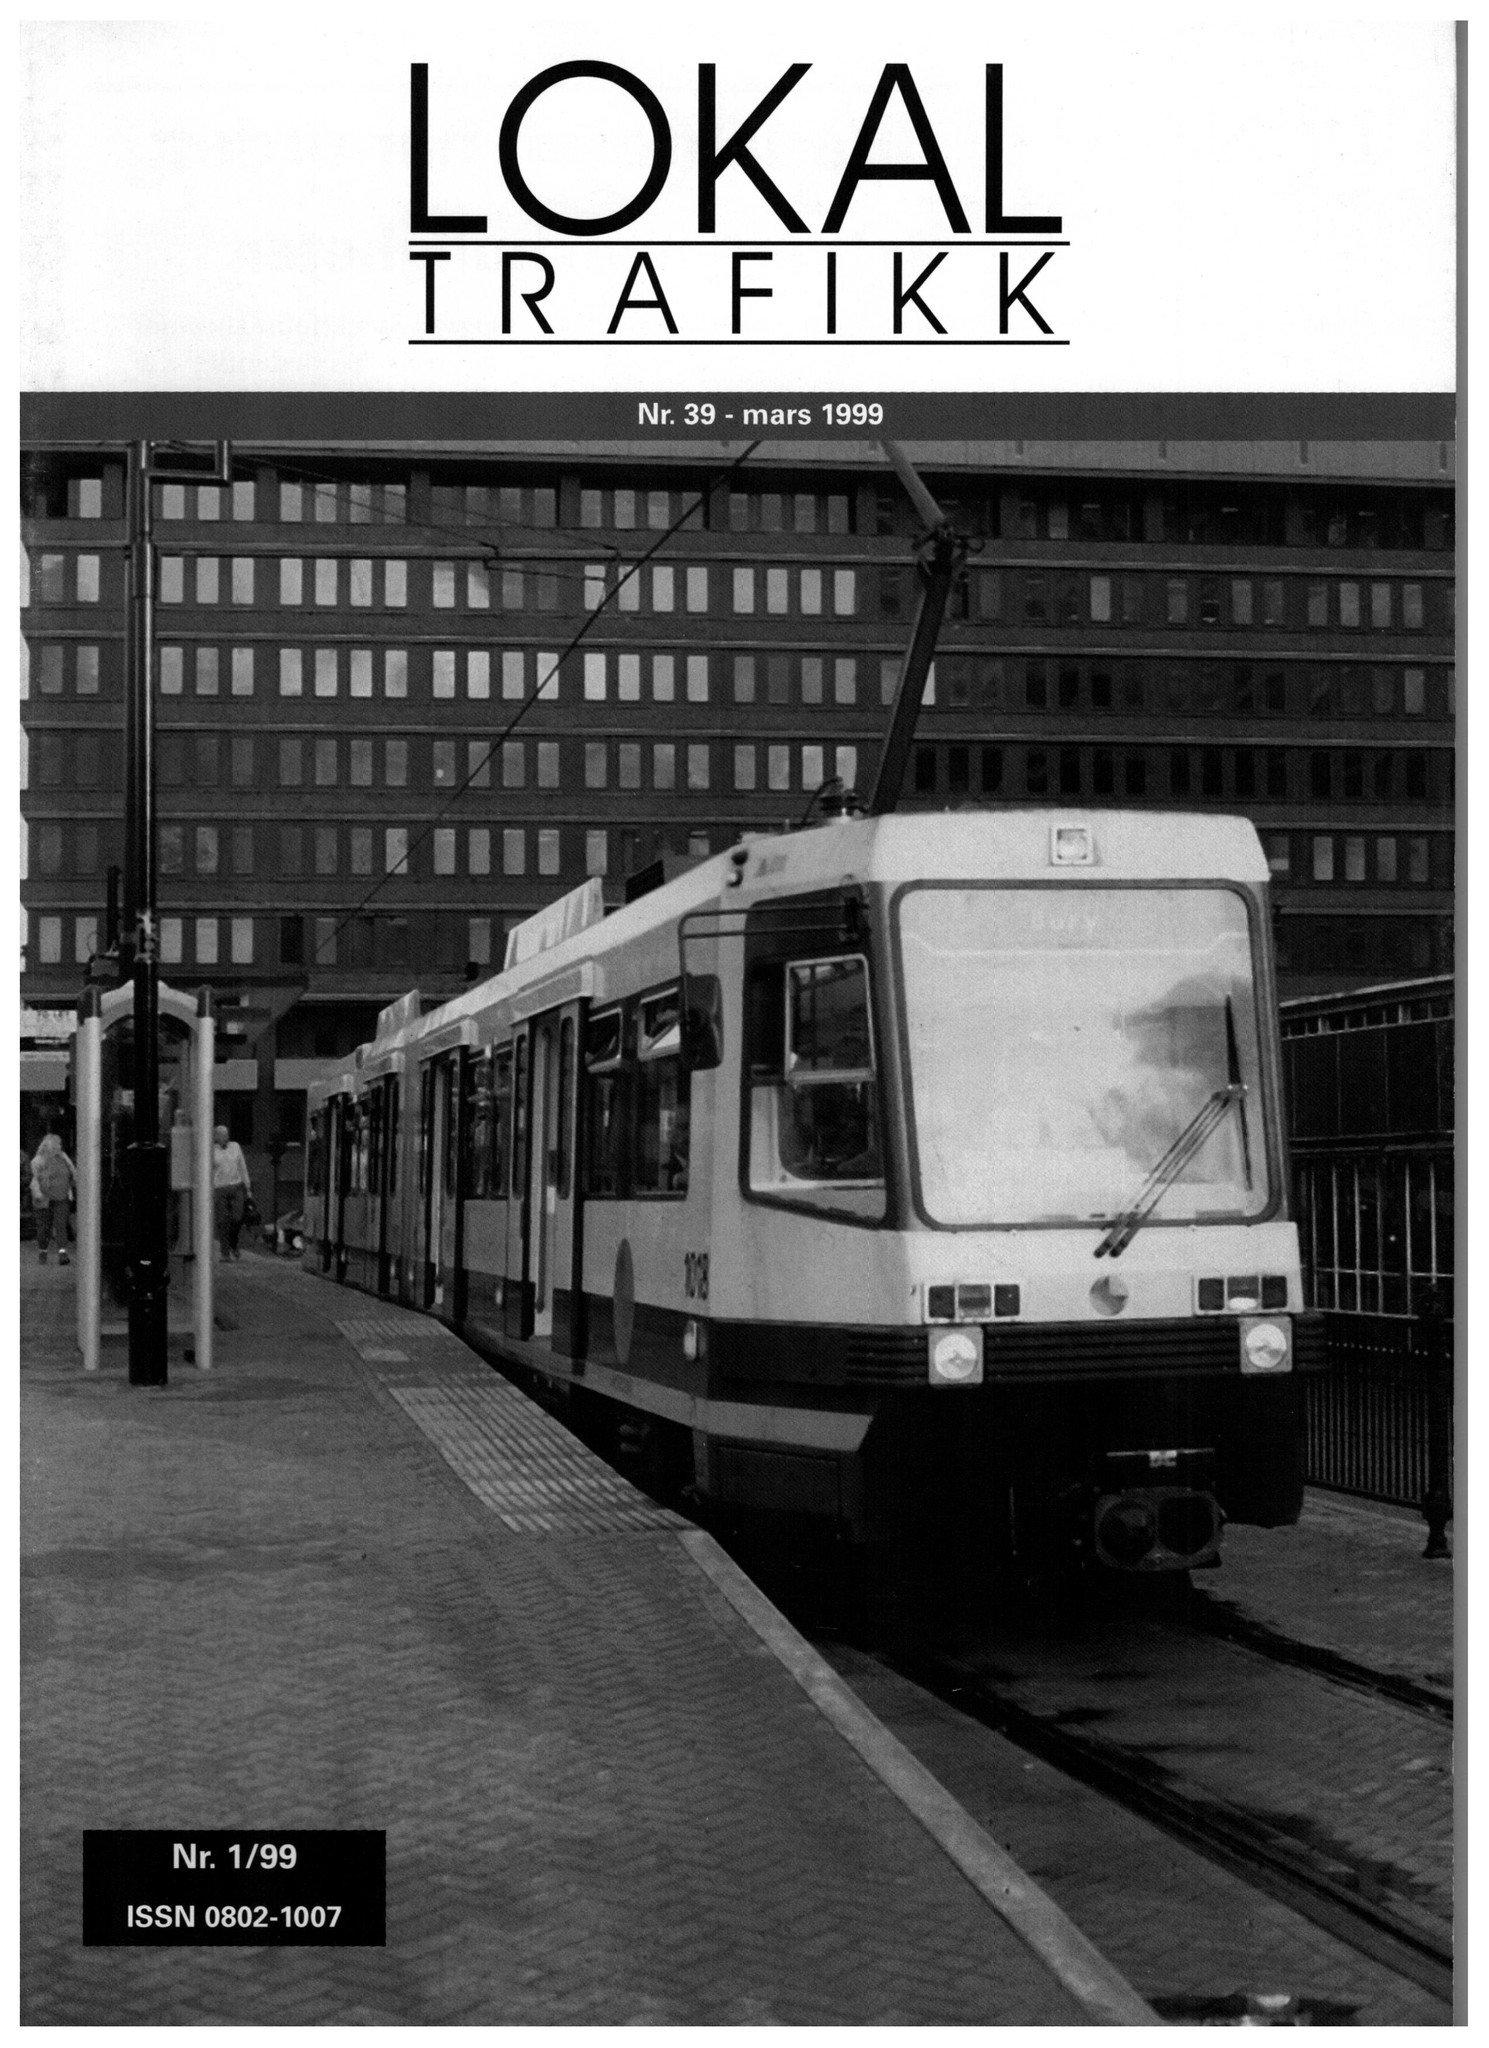 Lokaltrafikk #039